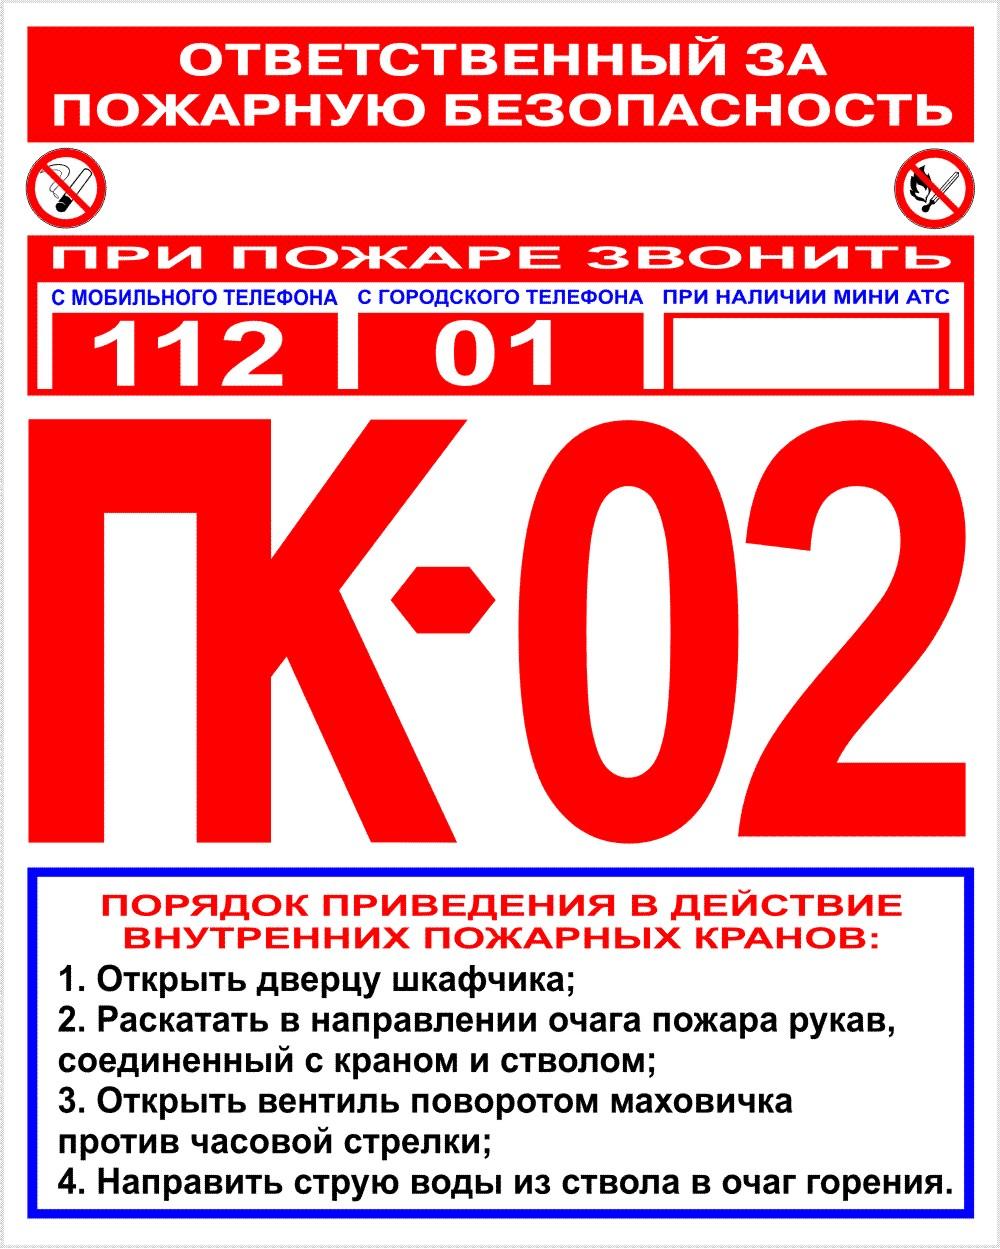 http://pozhproekt.ru/wp-content/uploads/2010/06/pk.jpg